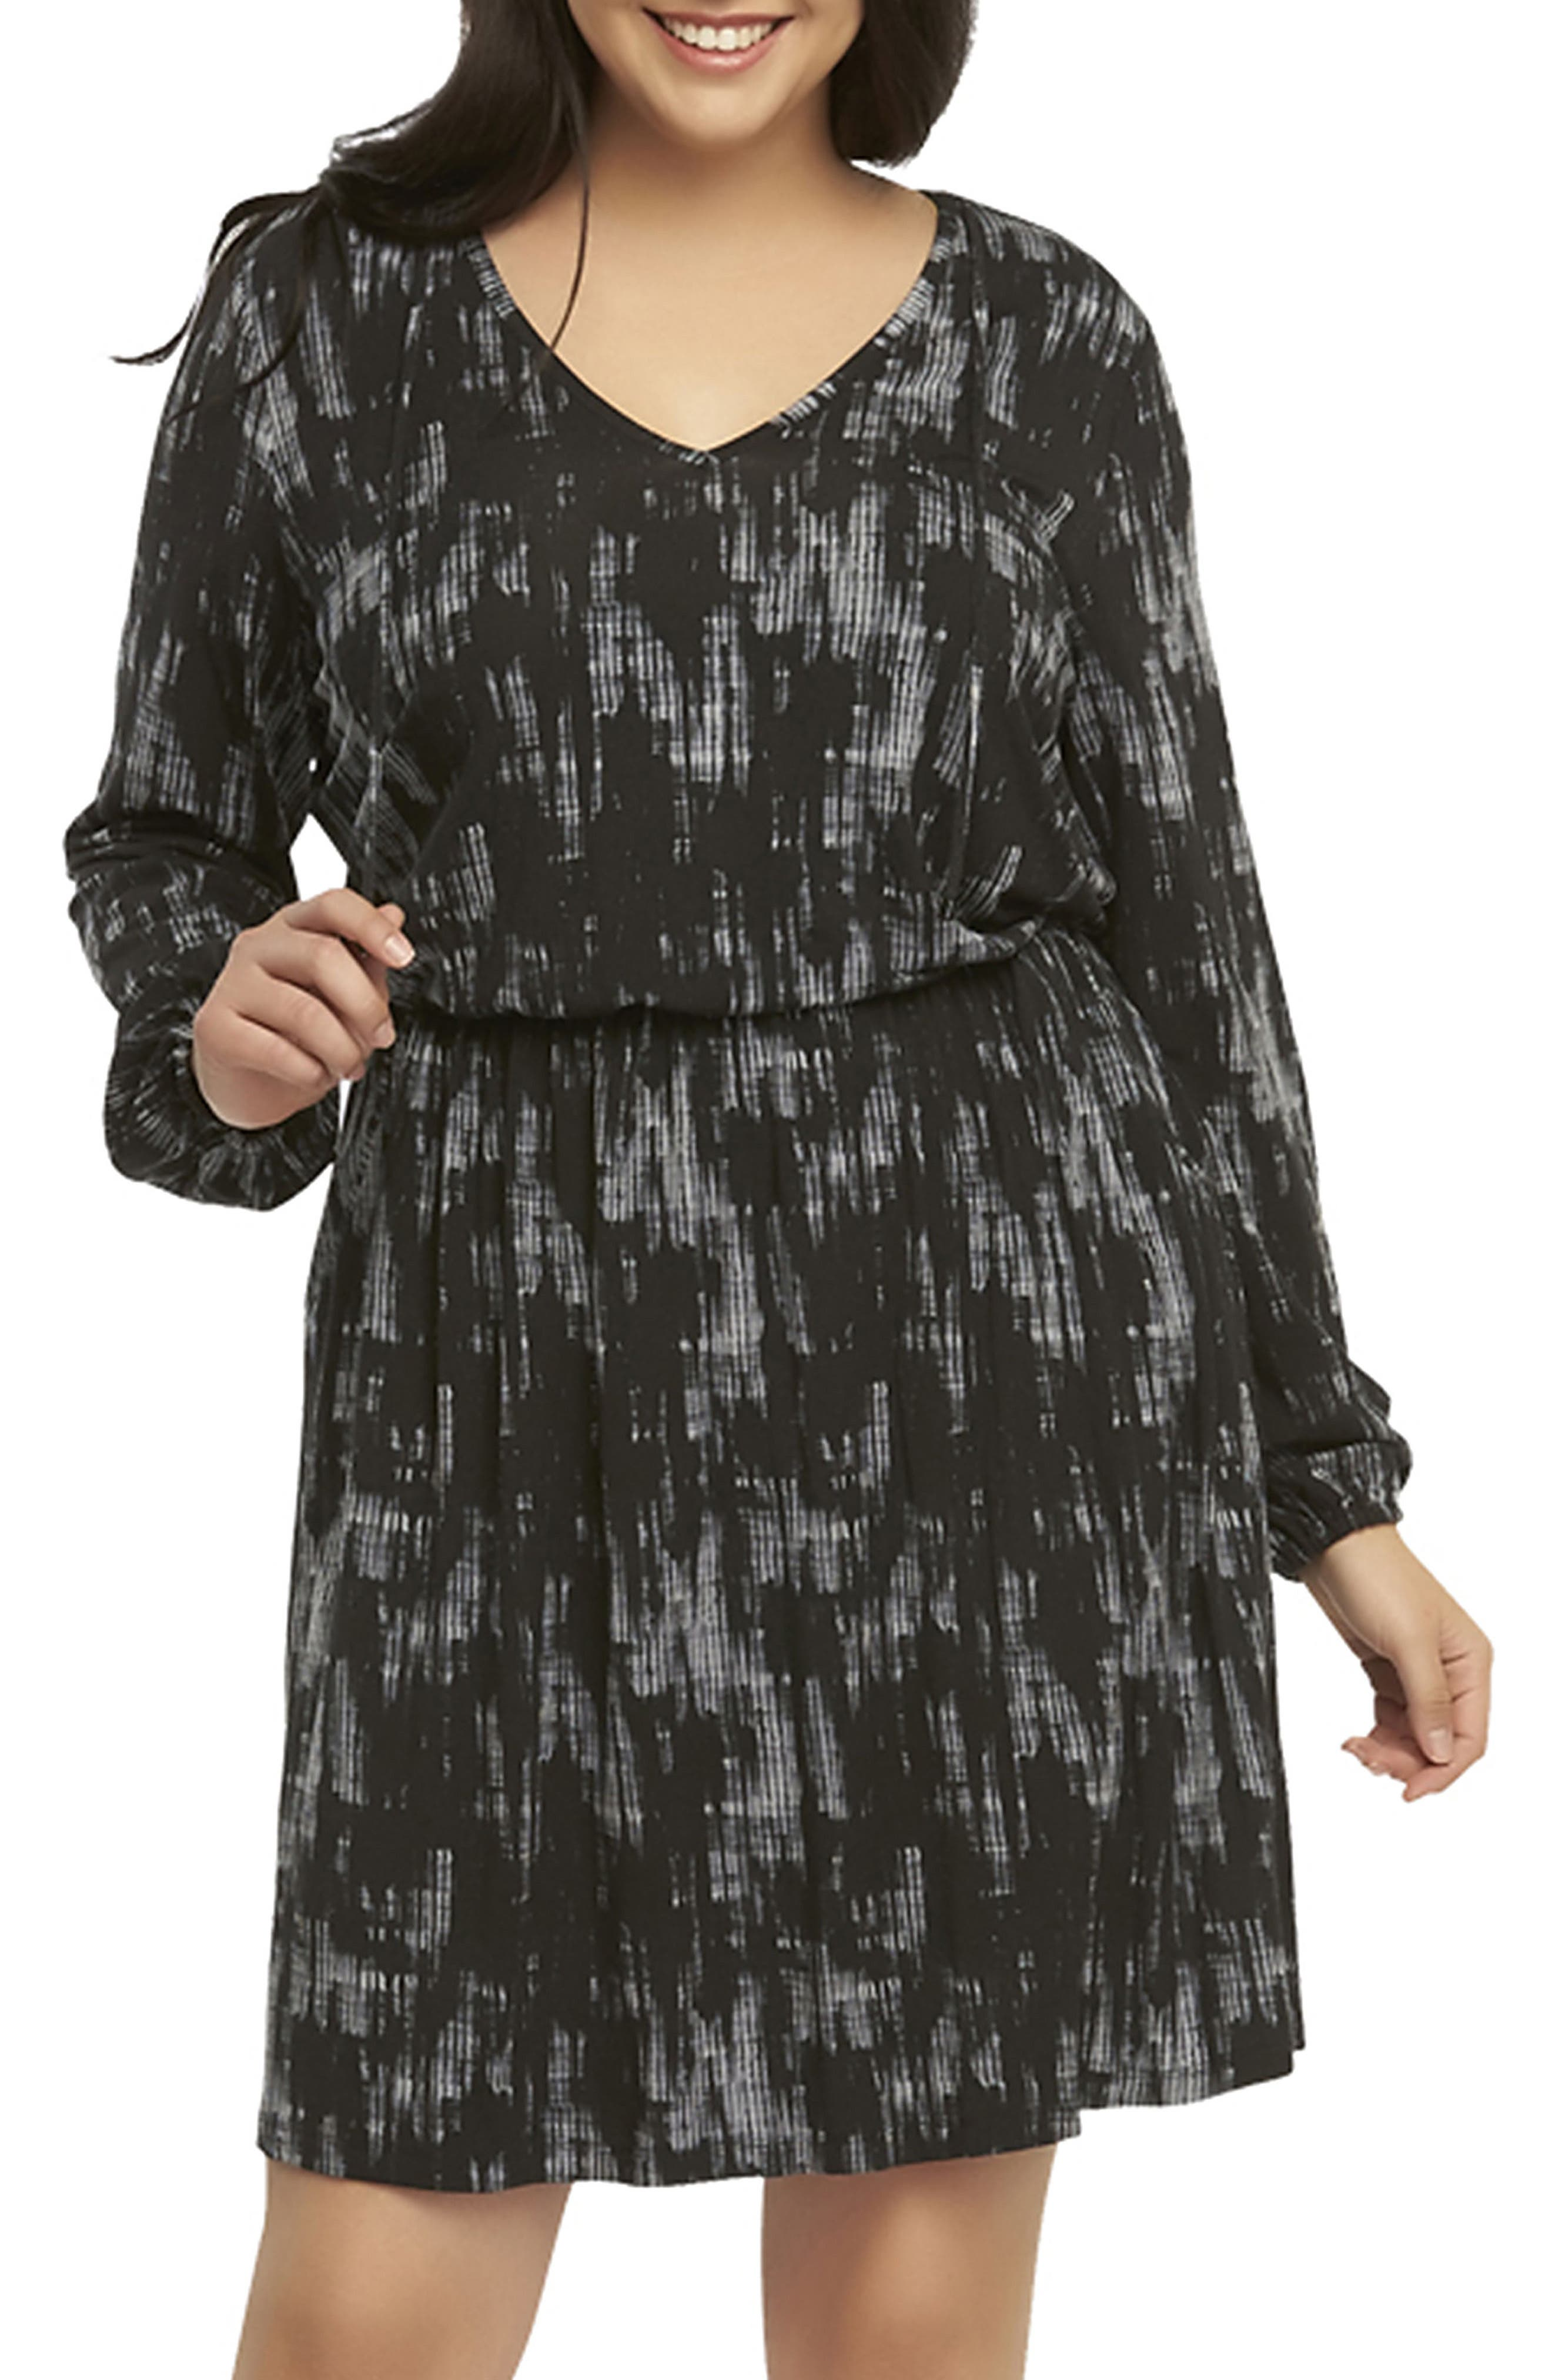 Alternate Image 1 Selected - Tart 'Robby' Print Jersey V-Neck Dress (Plus Size)